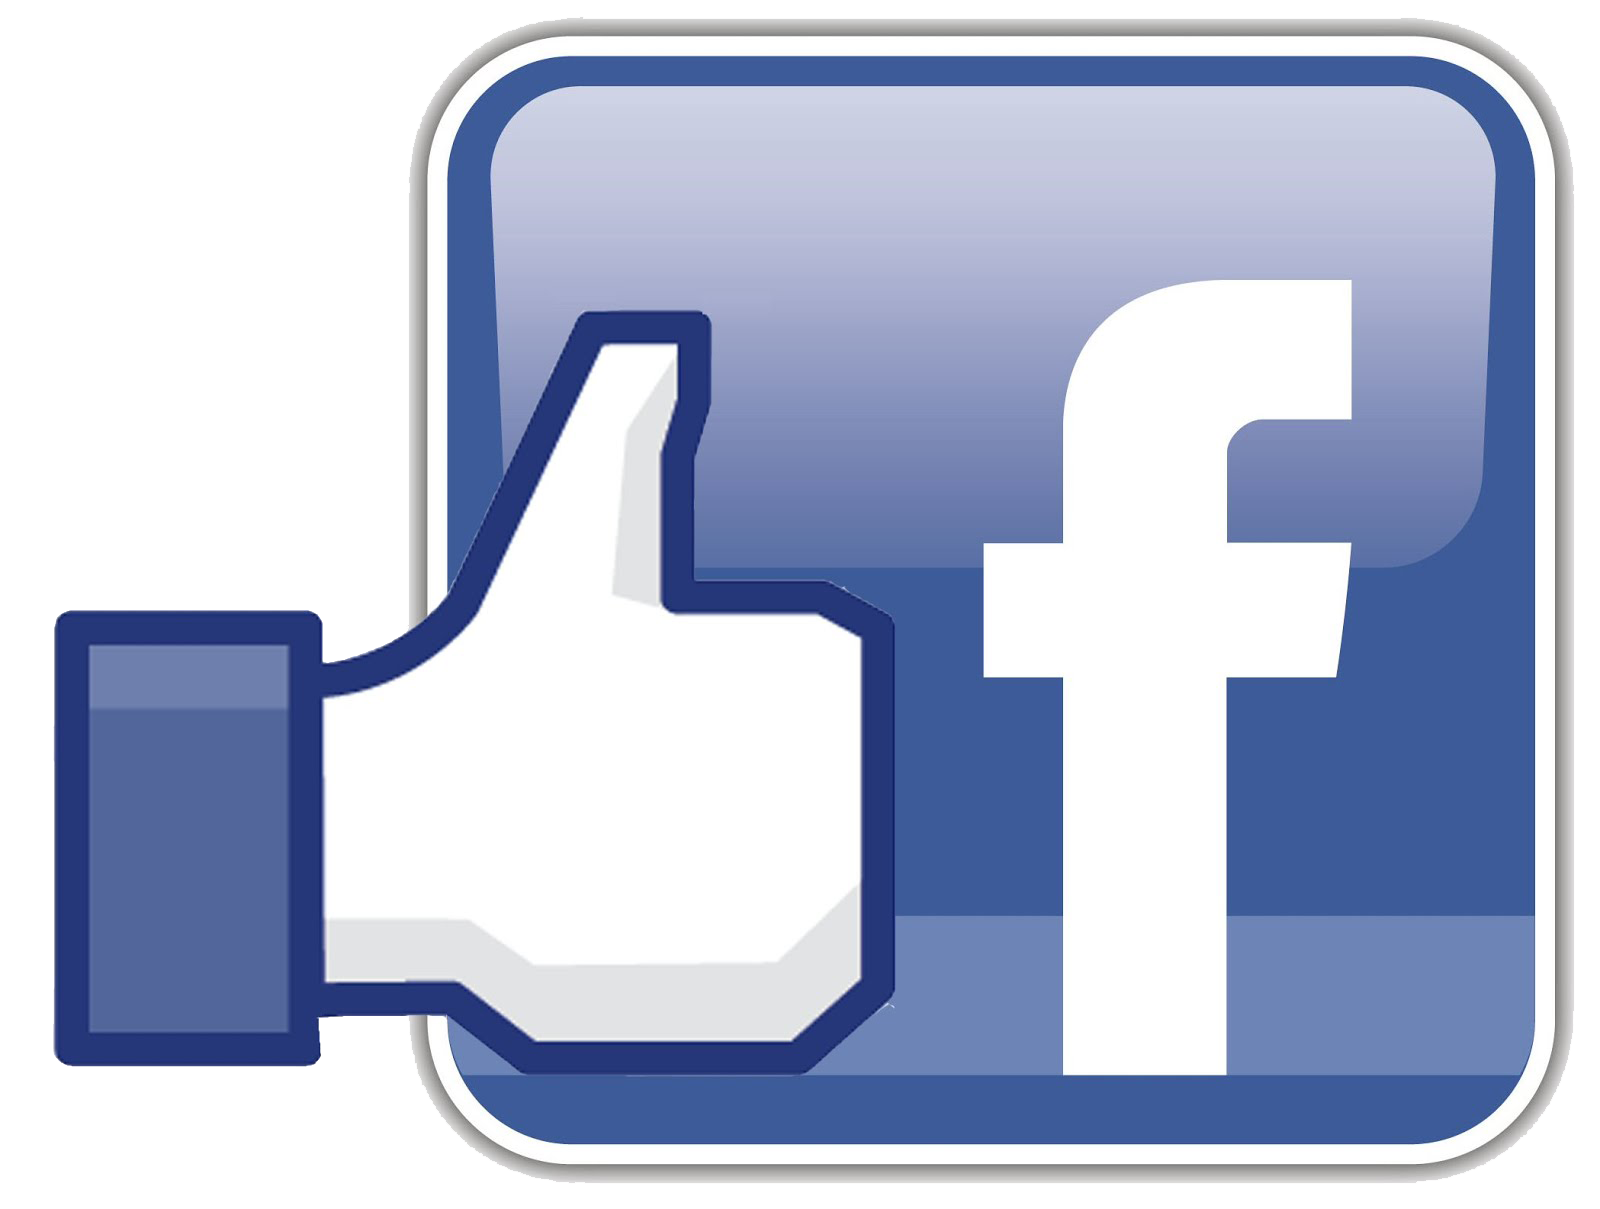 PNG Facebook Logo - 62995